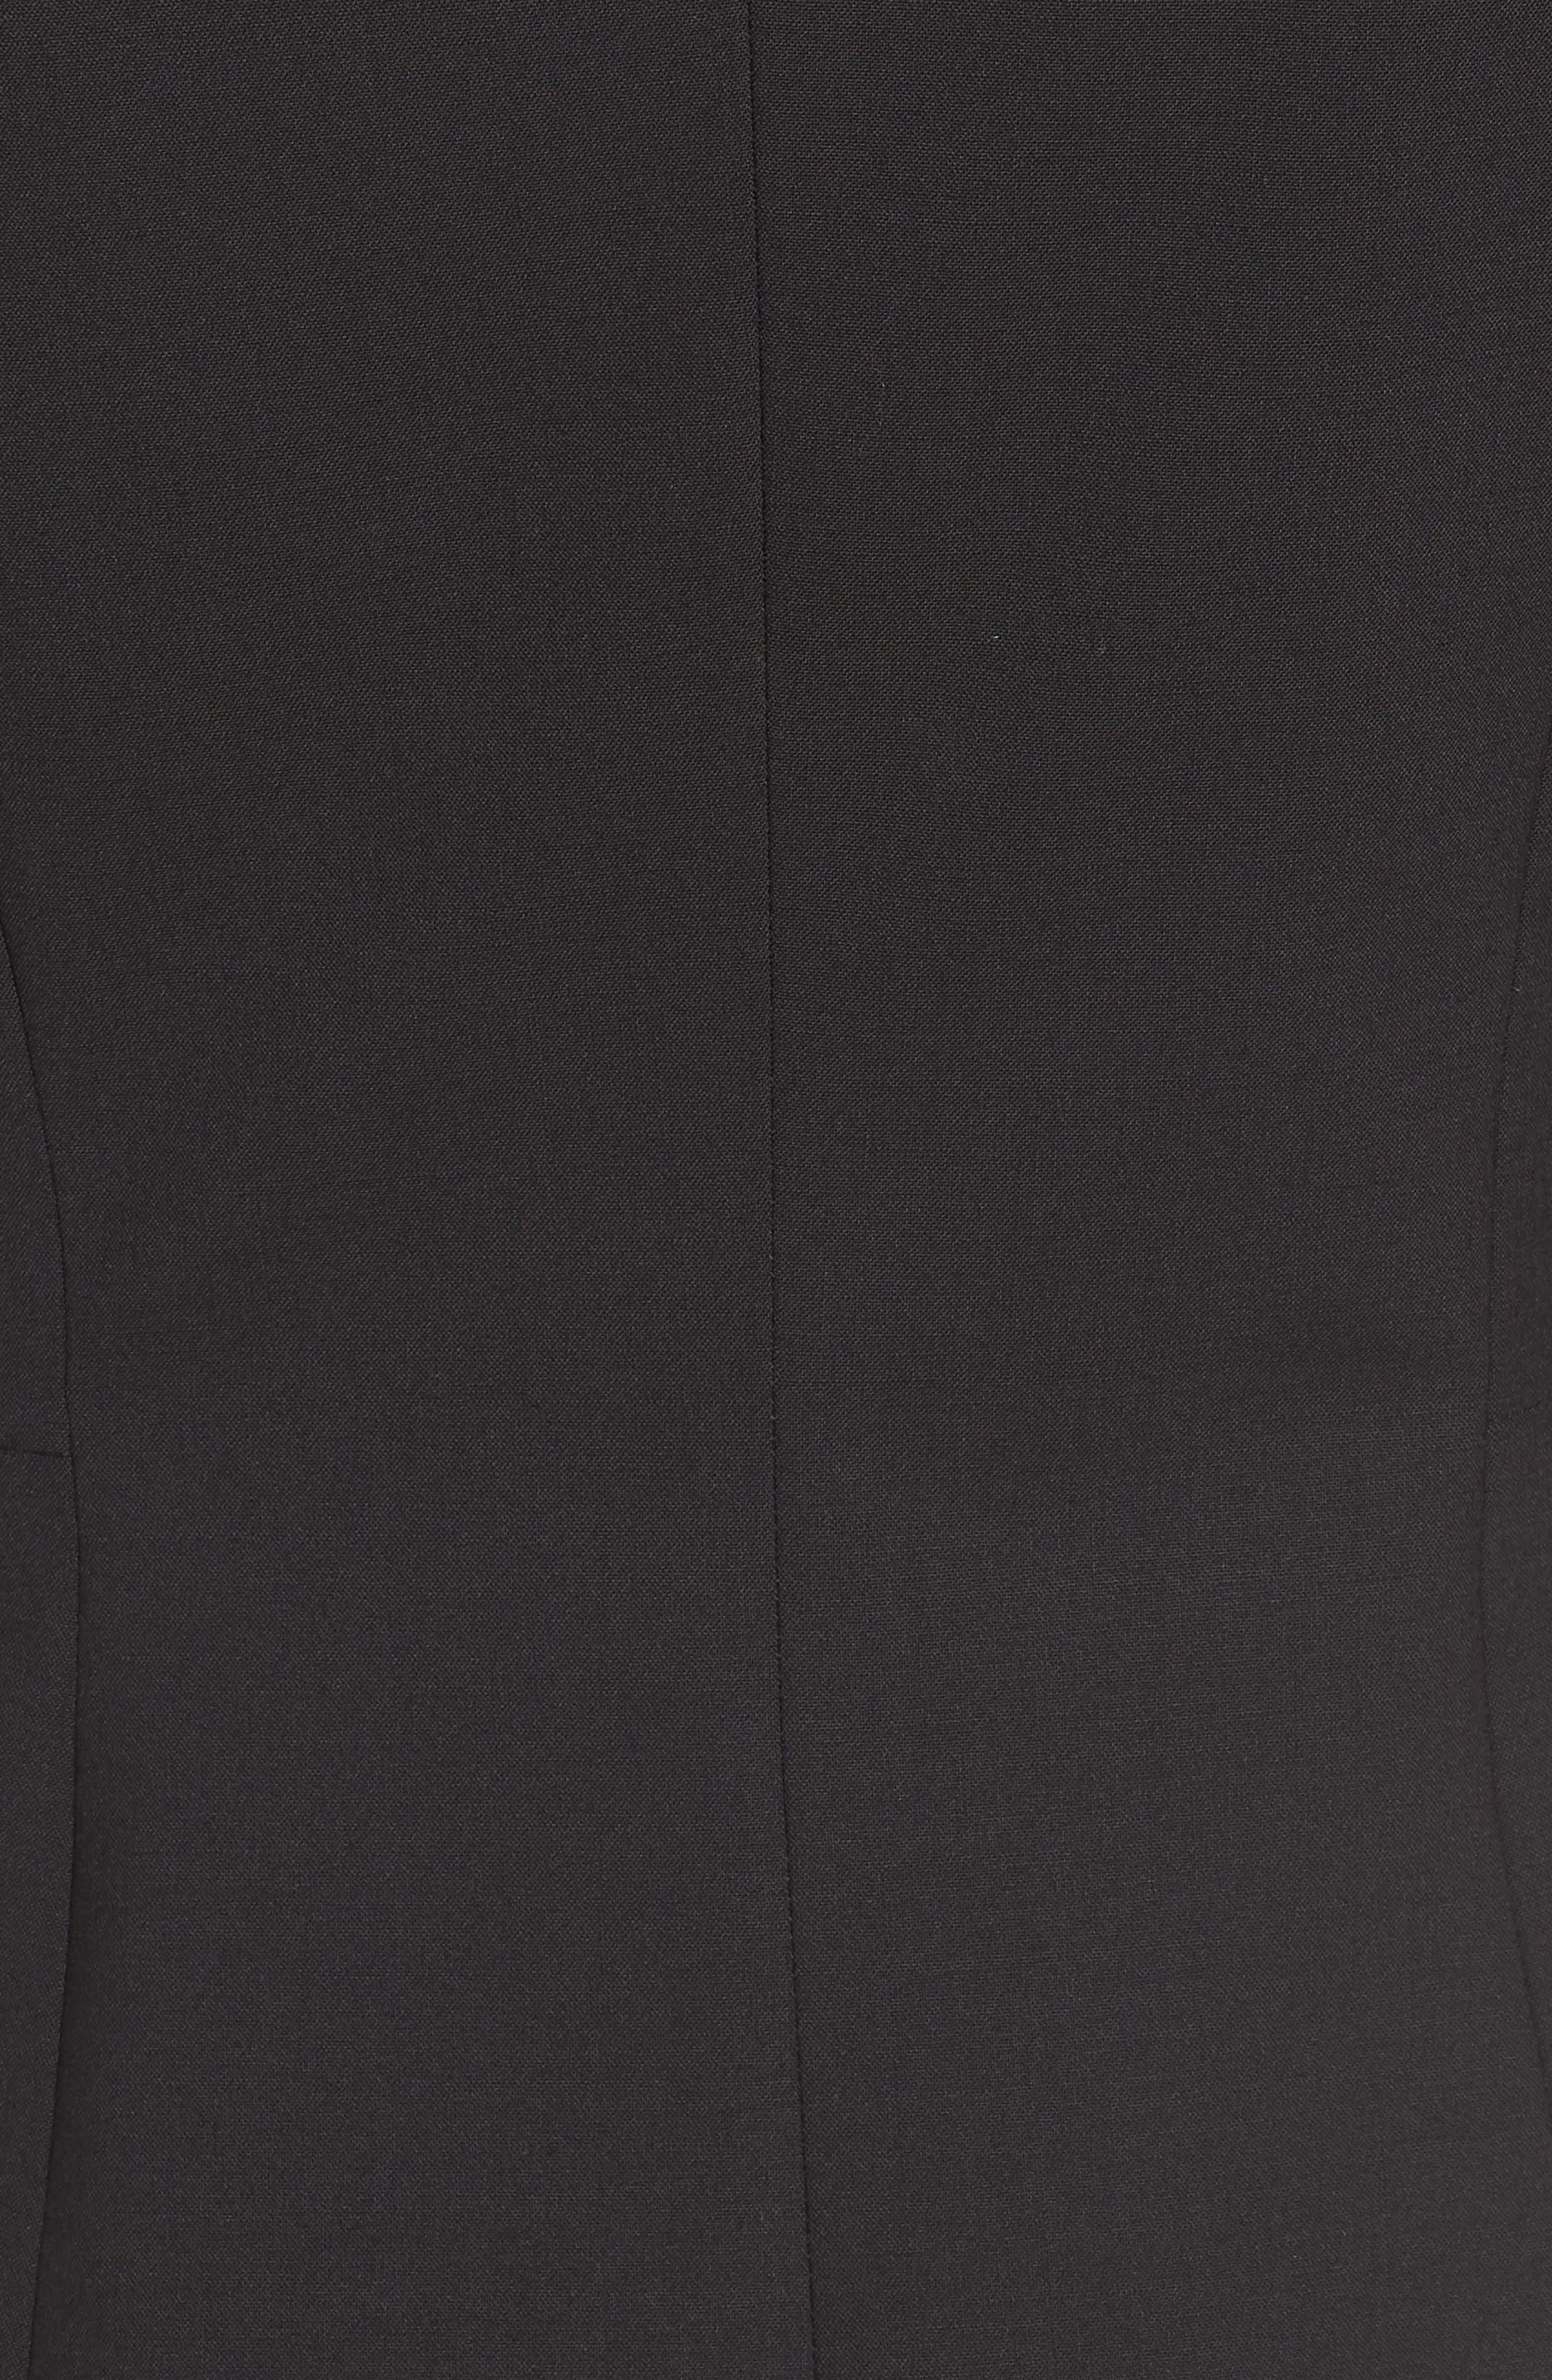 Jaru Stretch Wool Suit Jacket,                             Alternate thumbnail 5, color,                             Black